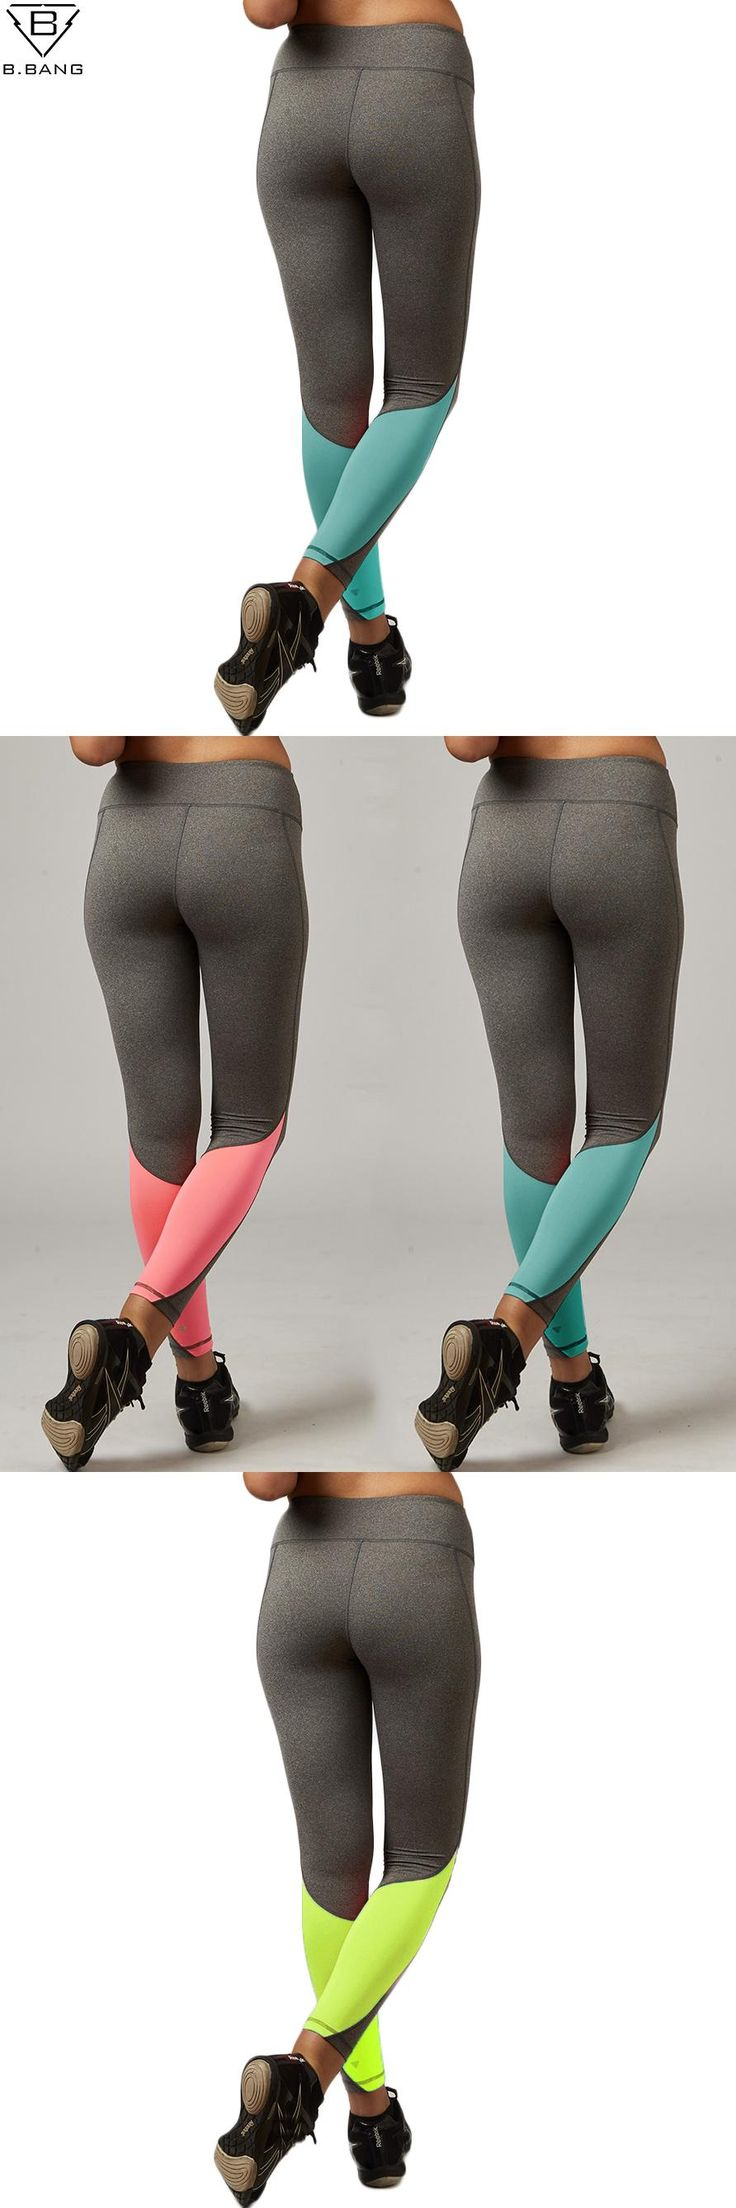 [Visit to Buy] B.BANG Women Sport Leggings Elastic Patchwork Pants for Running Gym Fitness Dry Quick Workout Capris pantalones mujer #Advertisement